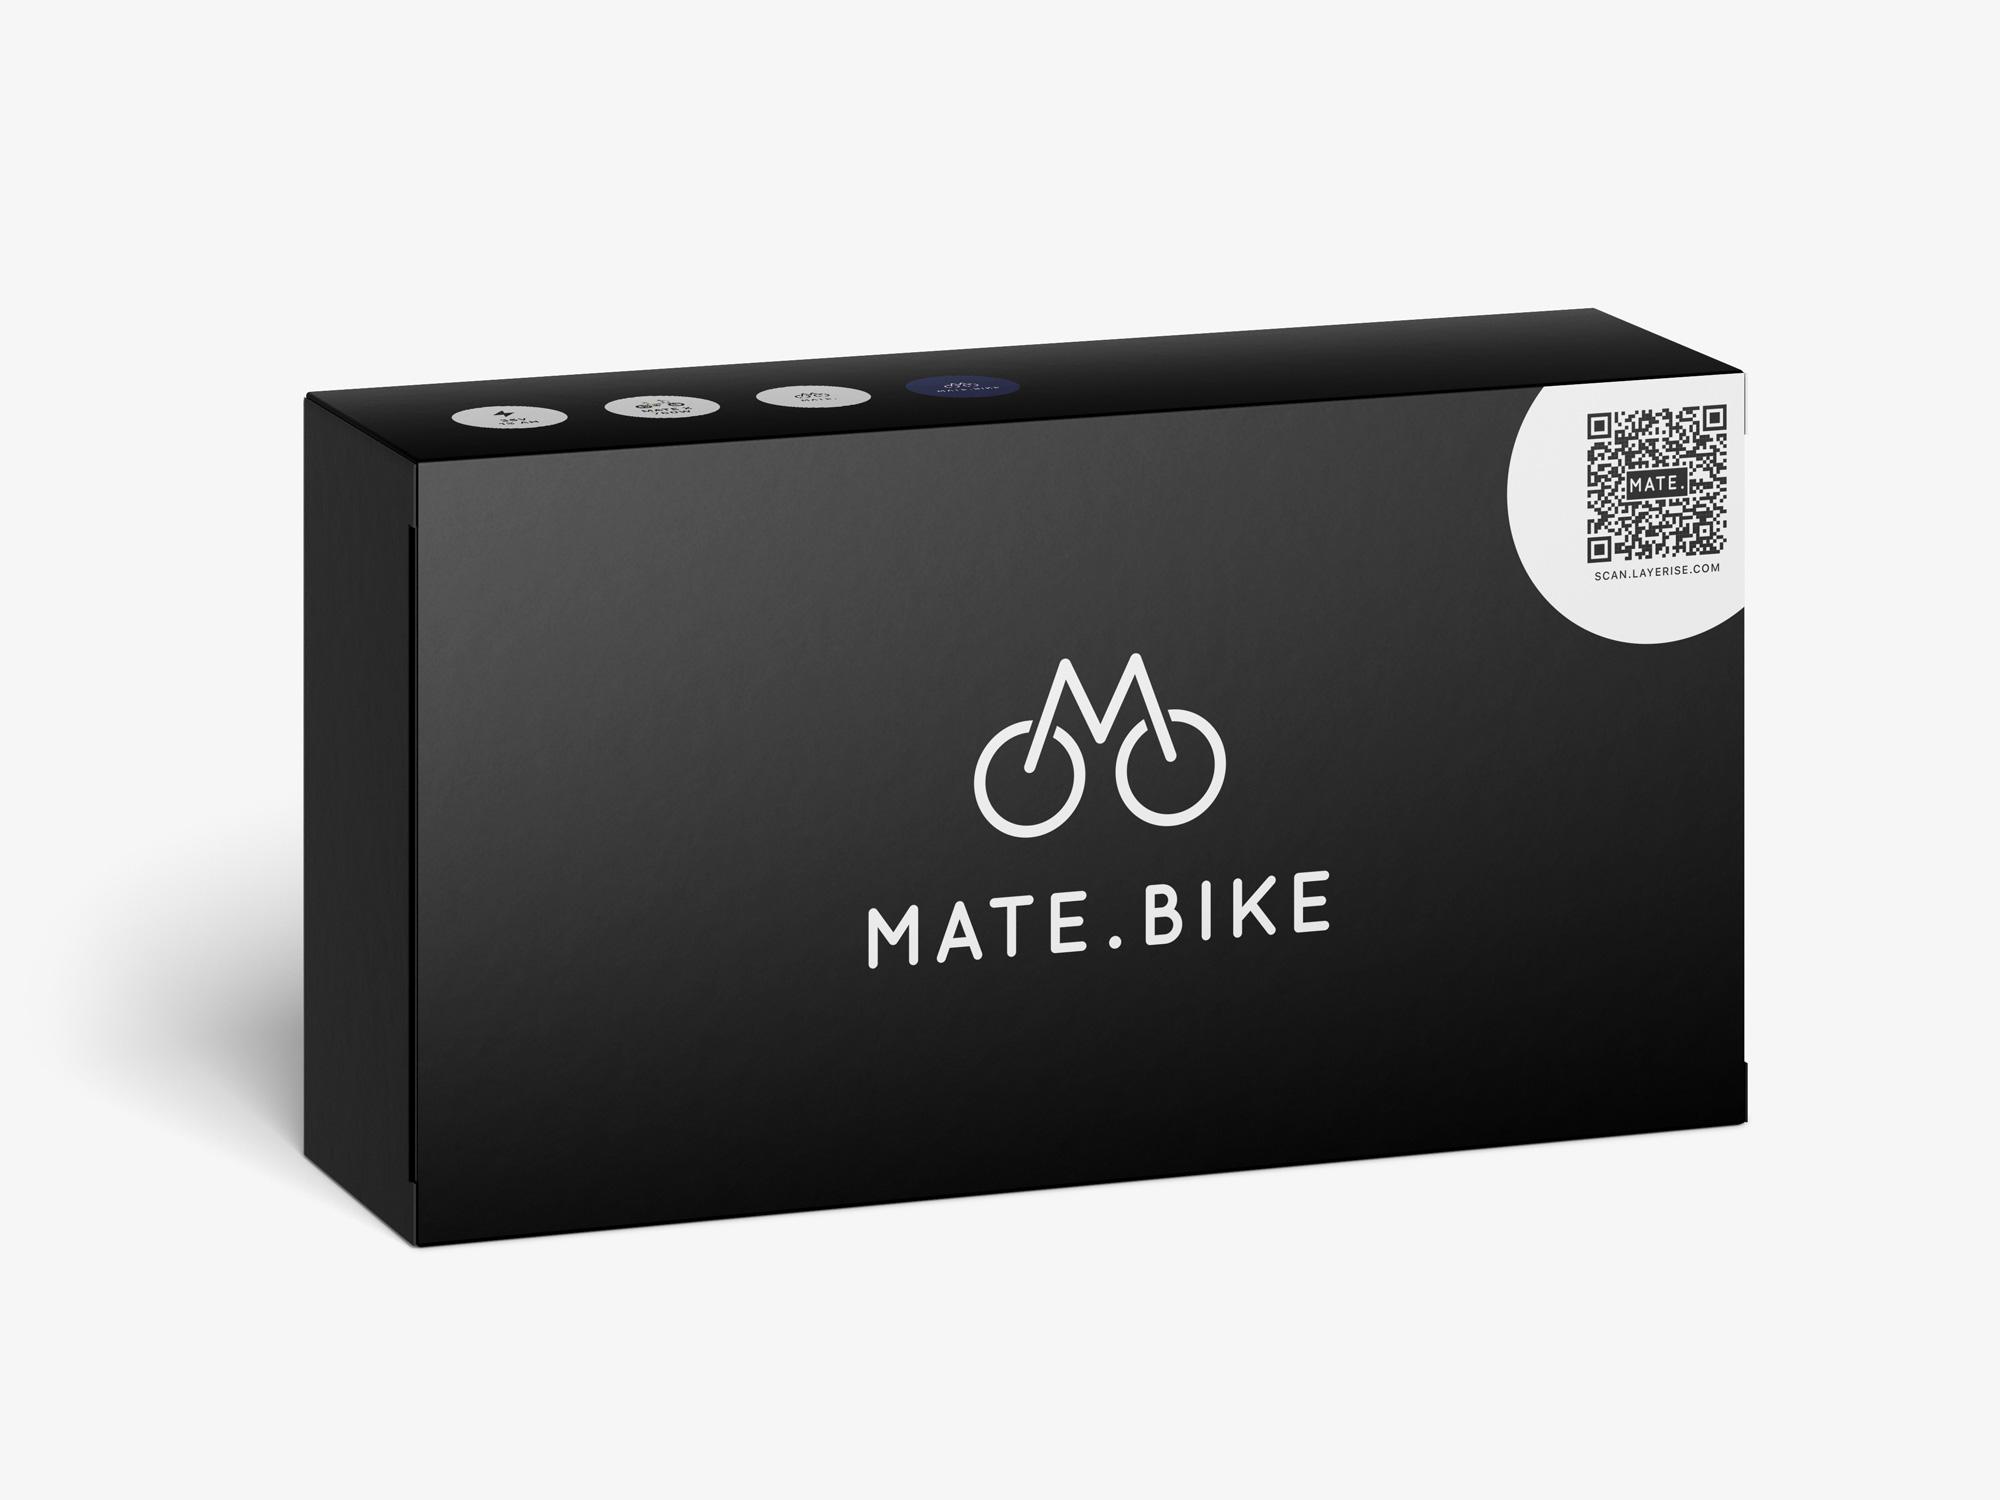 MATE X box